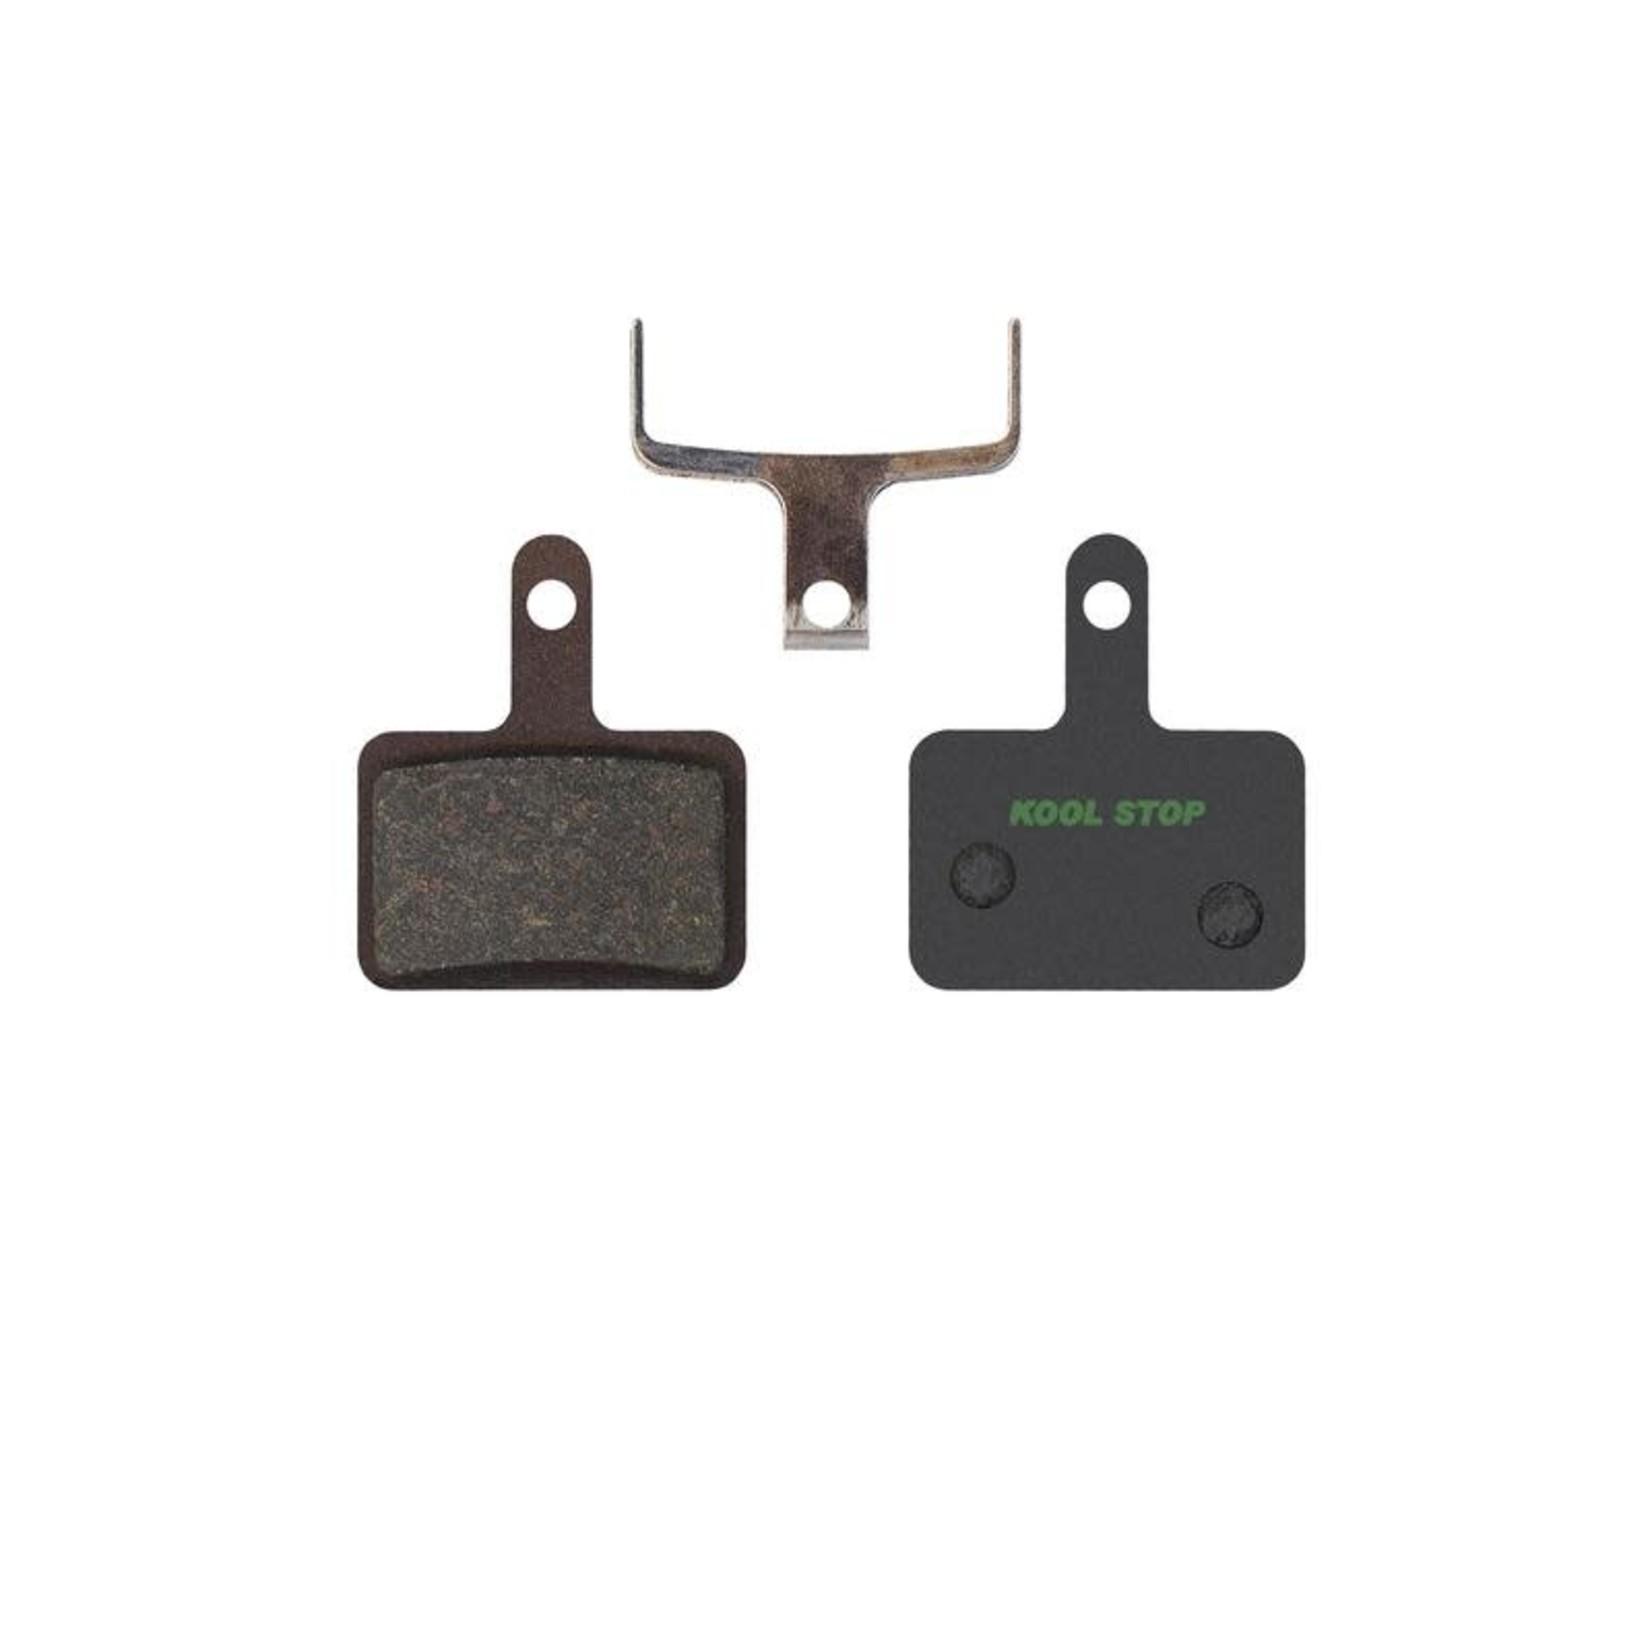 Kool-Stop Shimano Organic M575/M495 Disk Brake Pads, Ceramic Plate, E-Bike Compound, w/ Spring, #KS-D620E